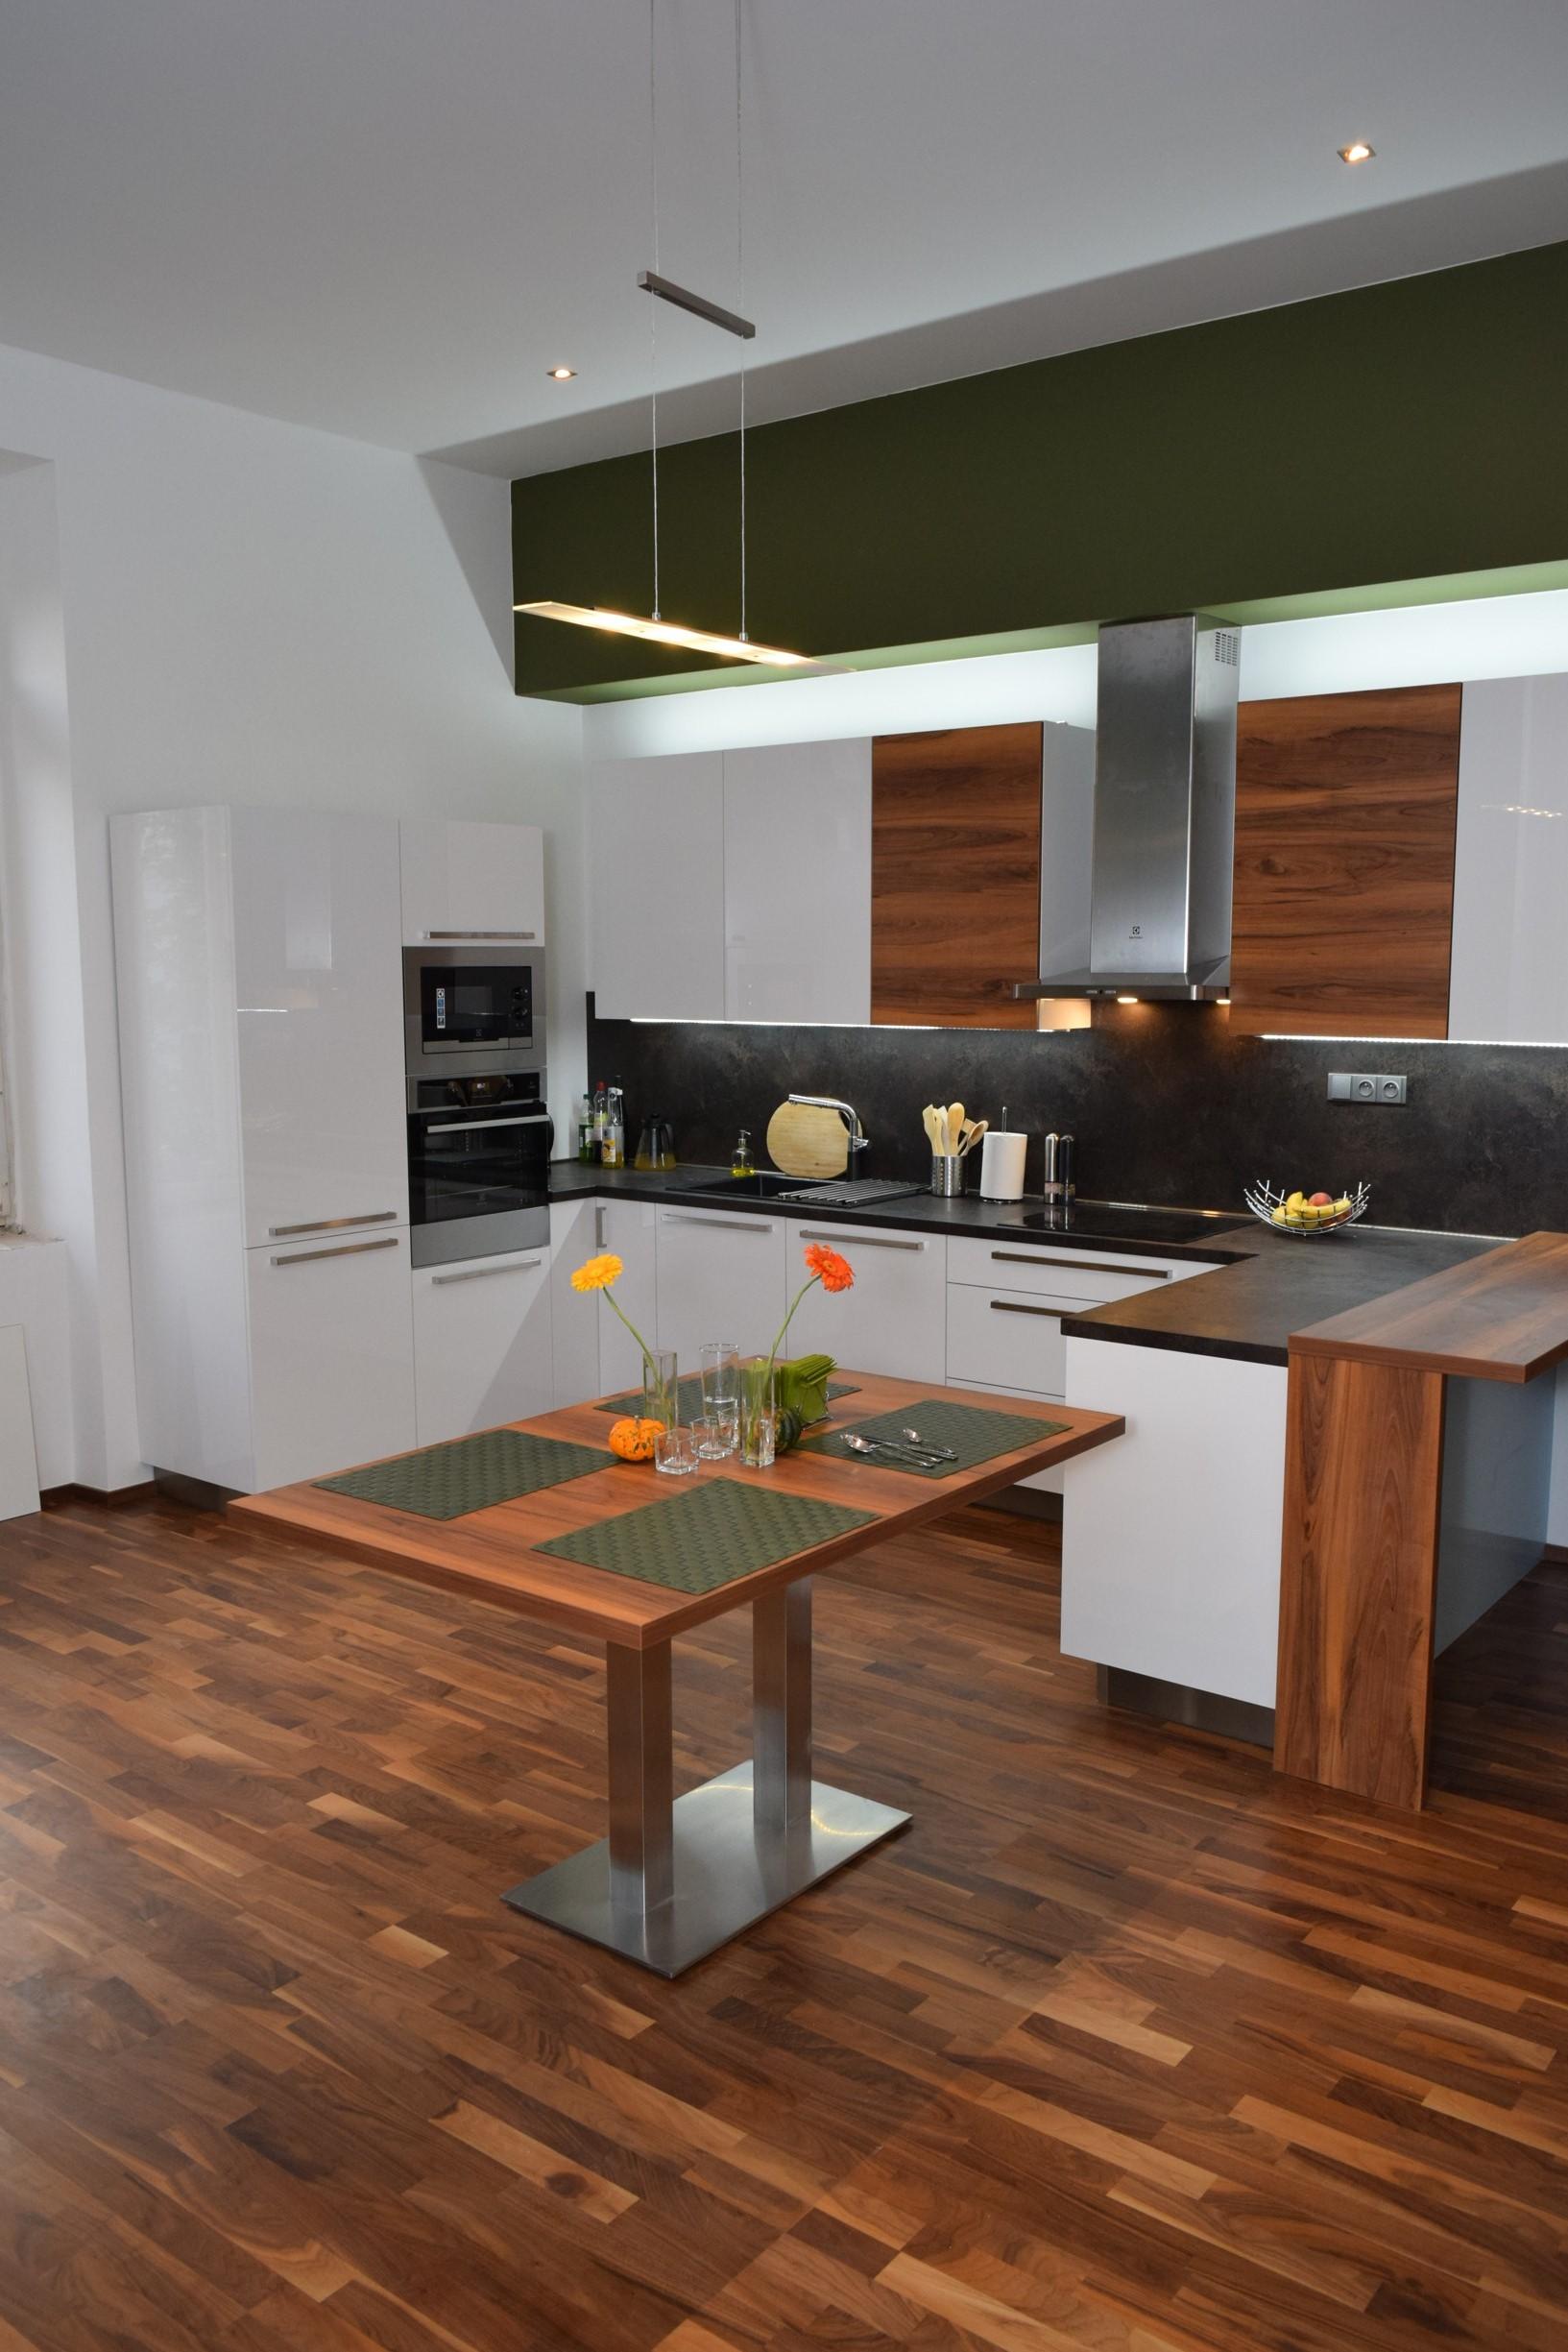 Jak si sám vyrobit kuchyň